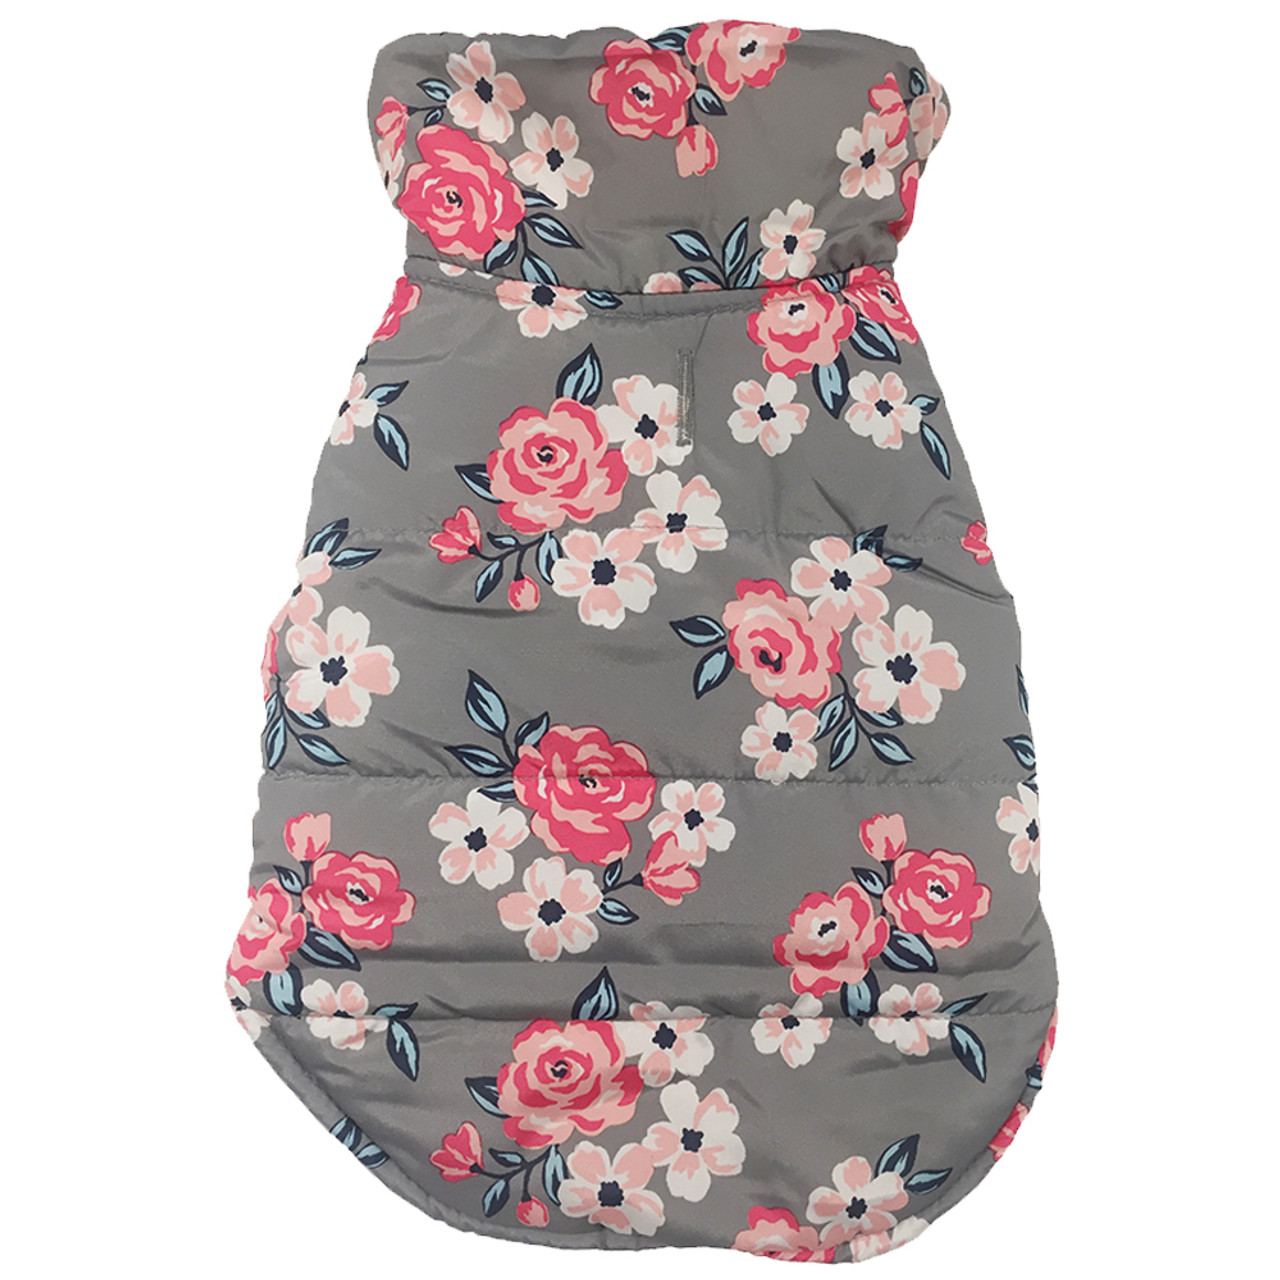 SimplyDog Gray Floral Shearling Wrap Dog Jacket